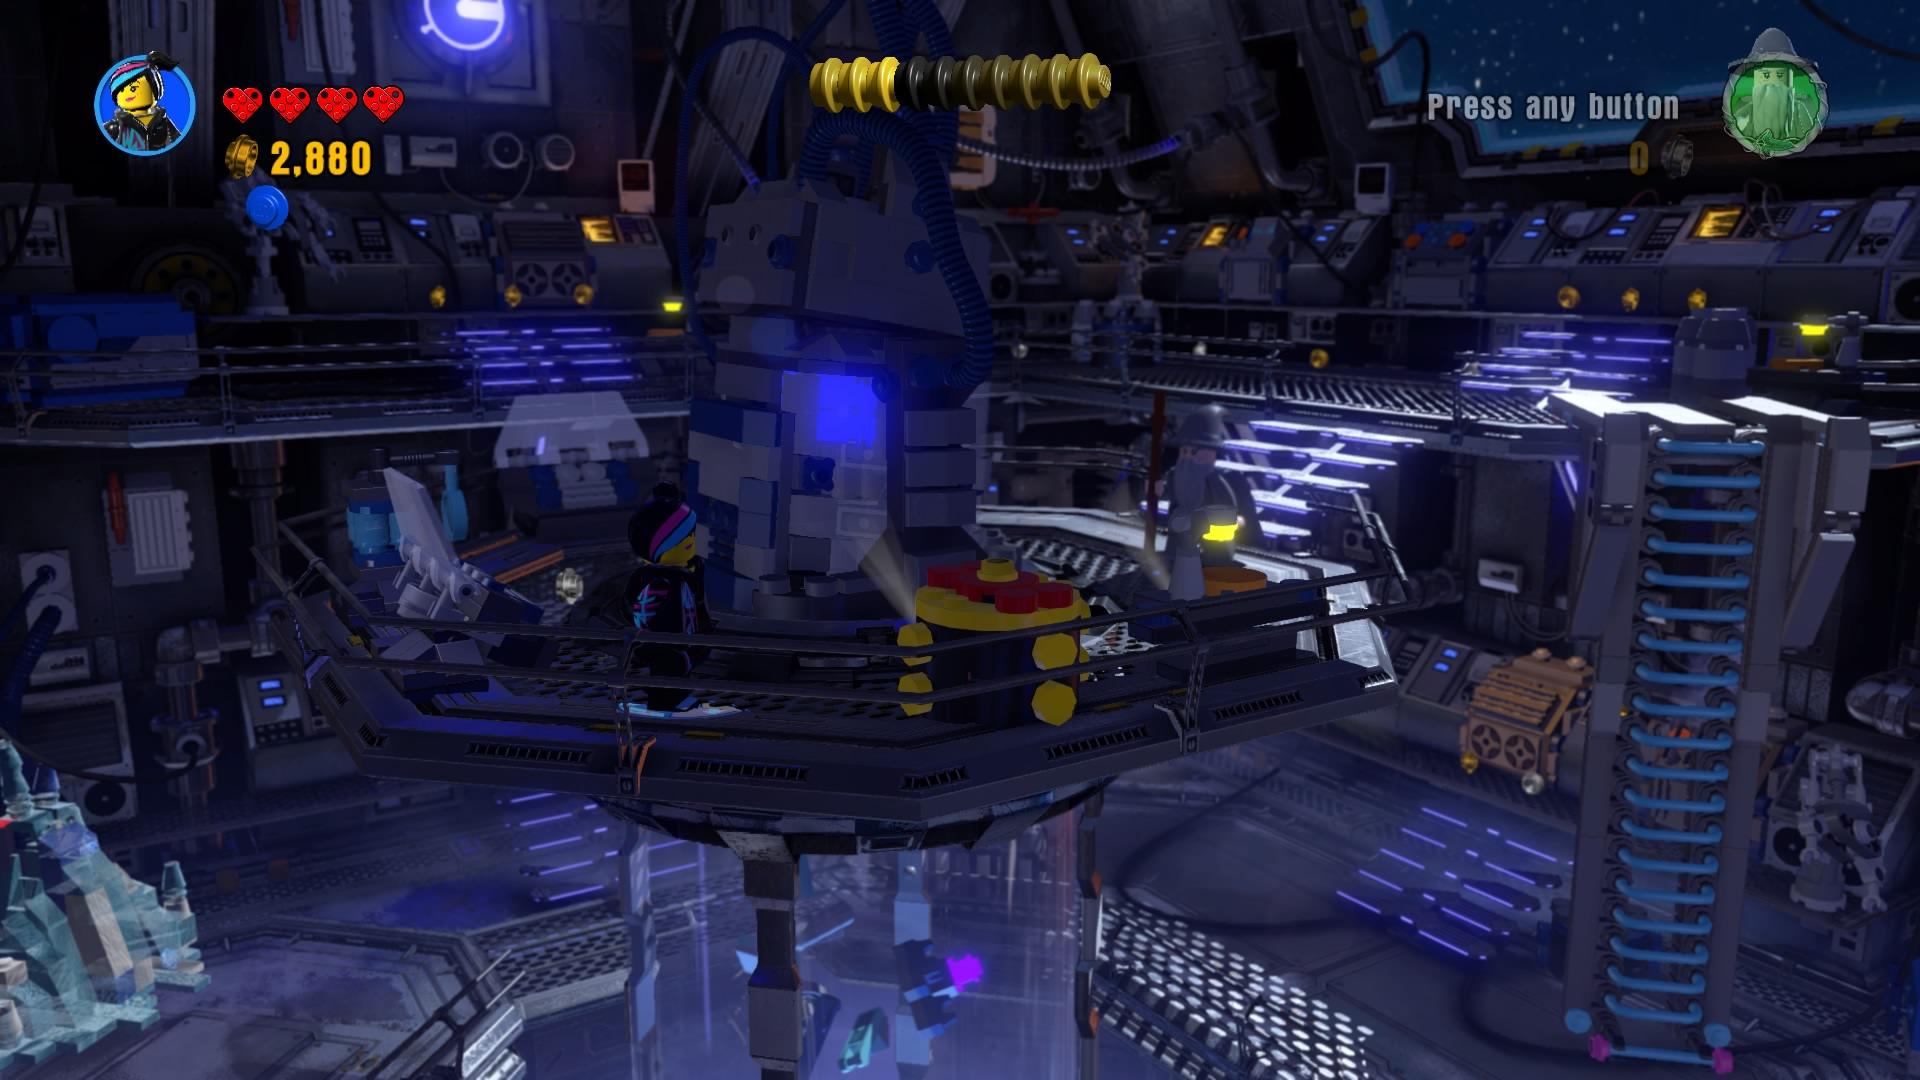 Lego Dimensions Story Mode Walkthrough Walkthroughs